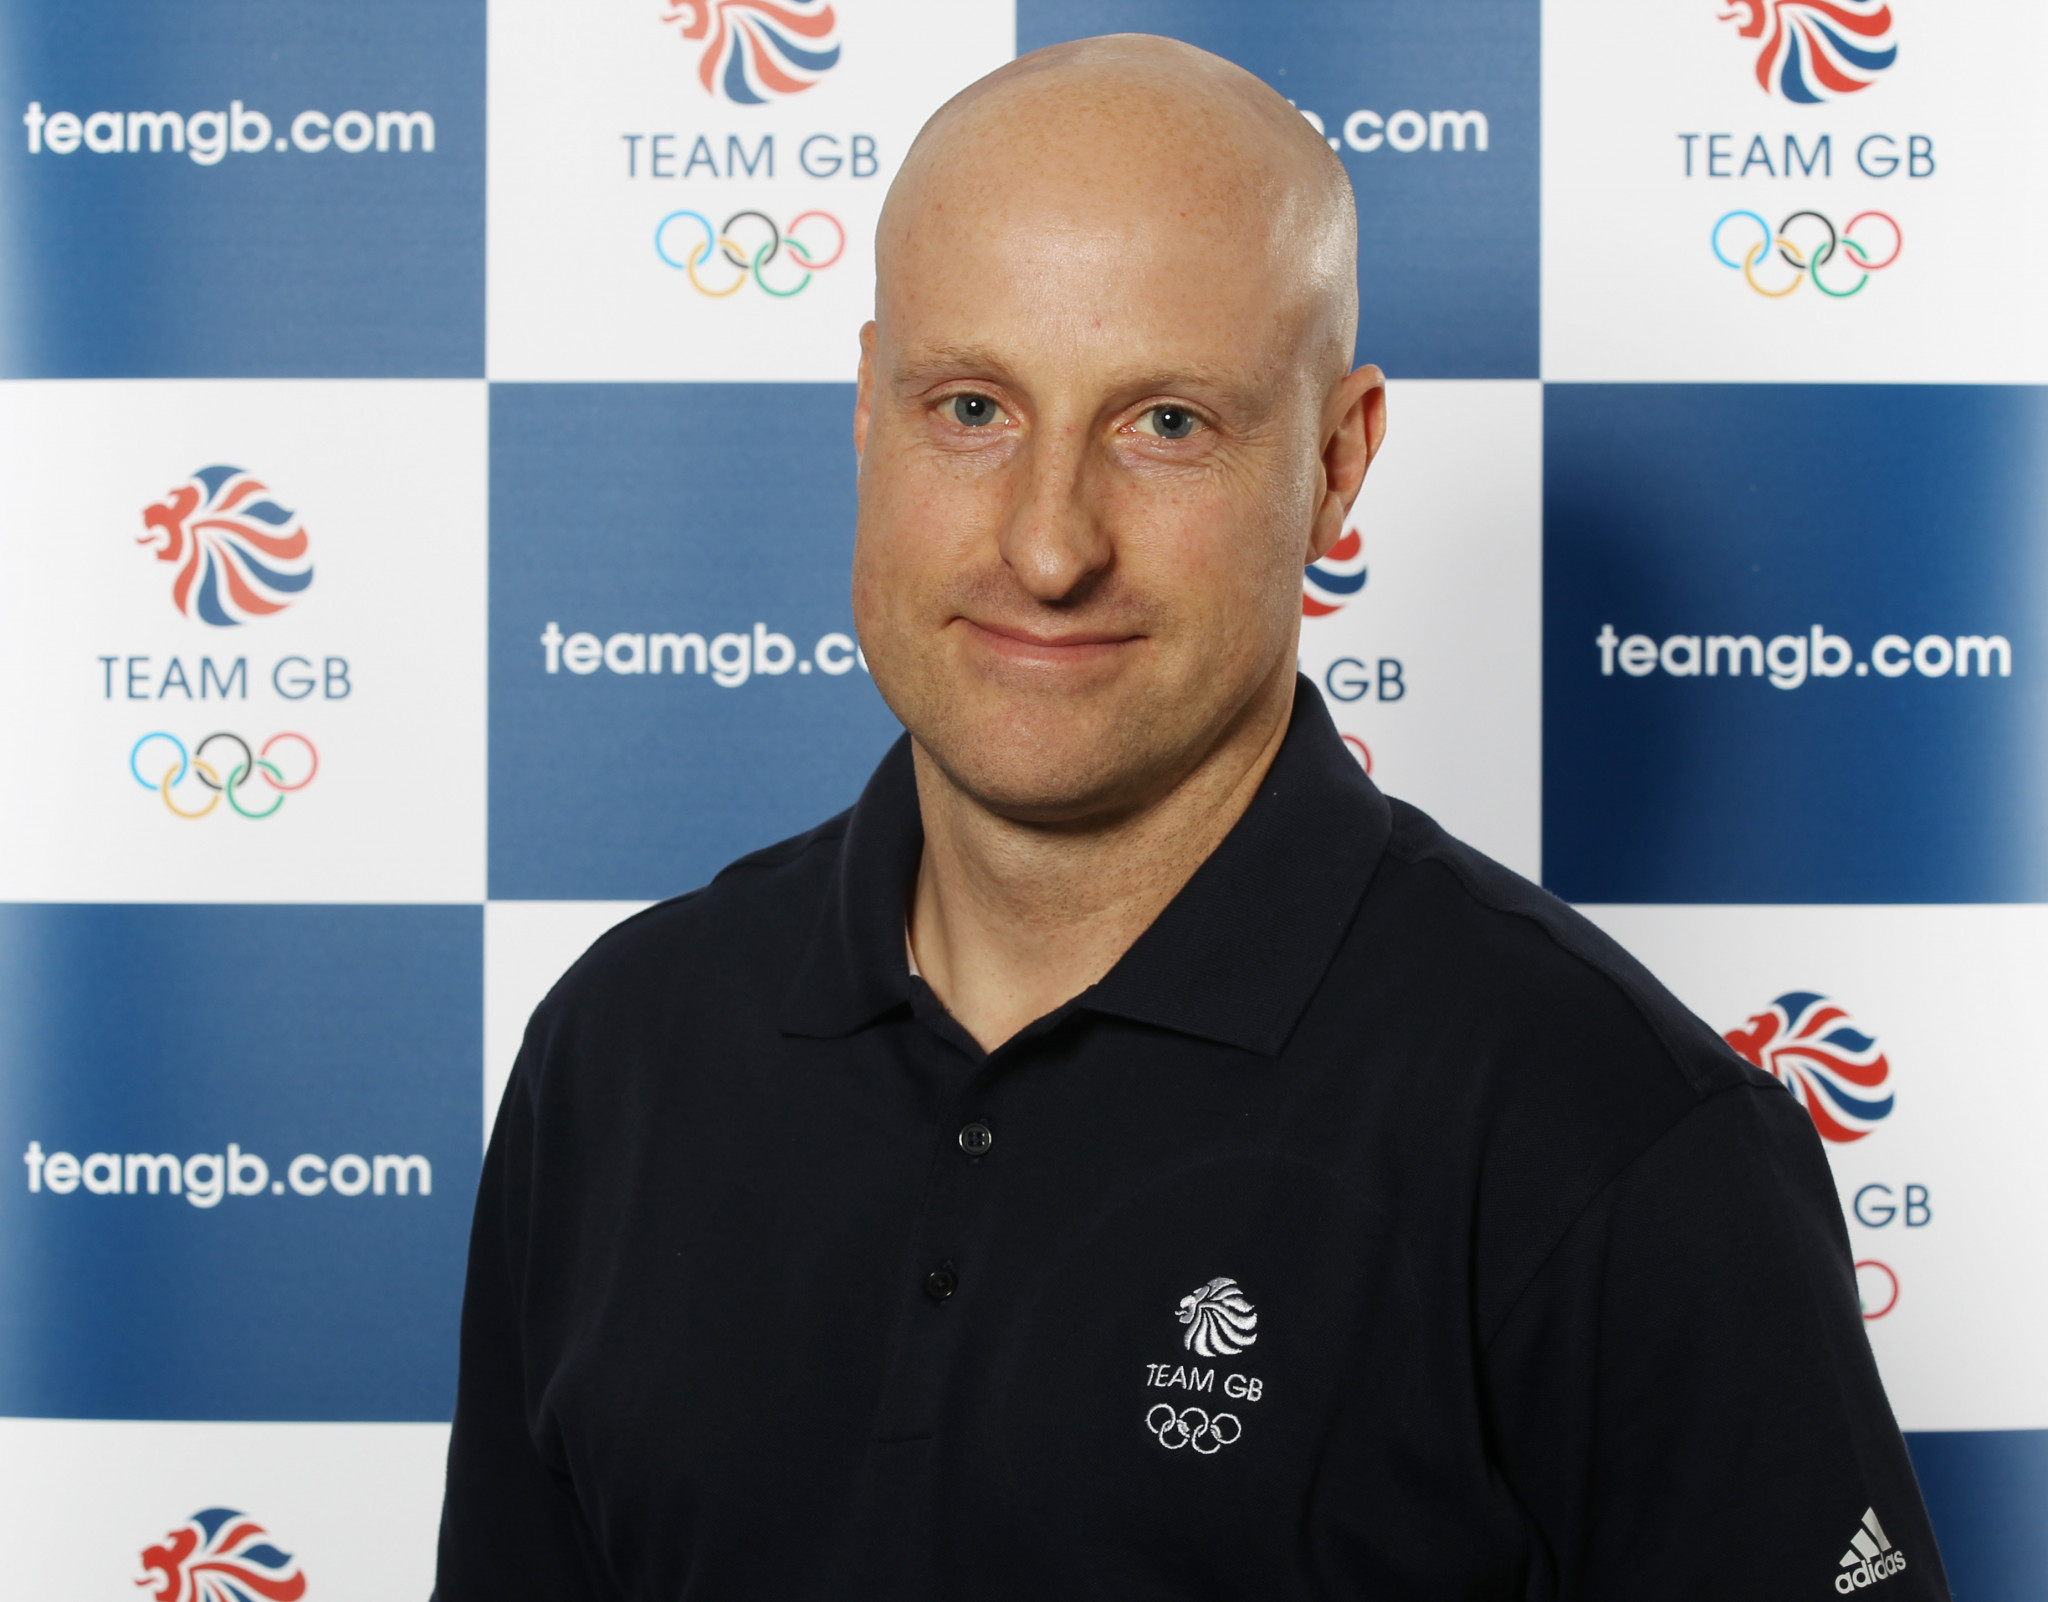 GB Taekwondo performance director Gary Hall said that China's Zheng Shuyin was